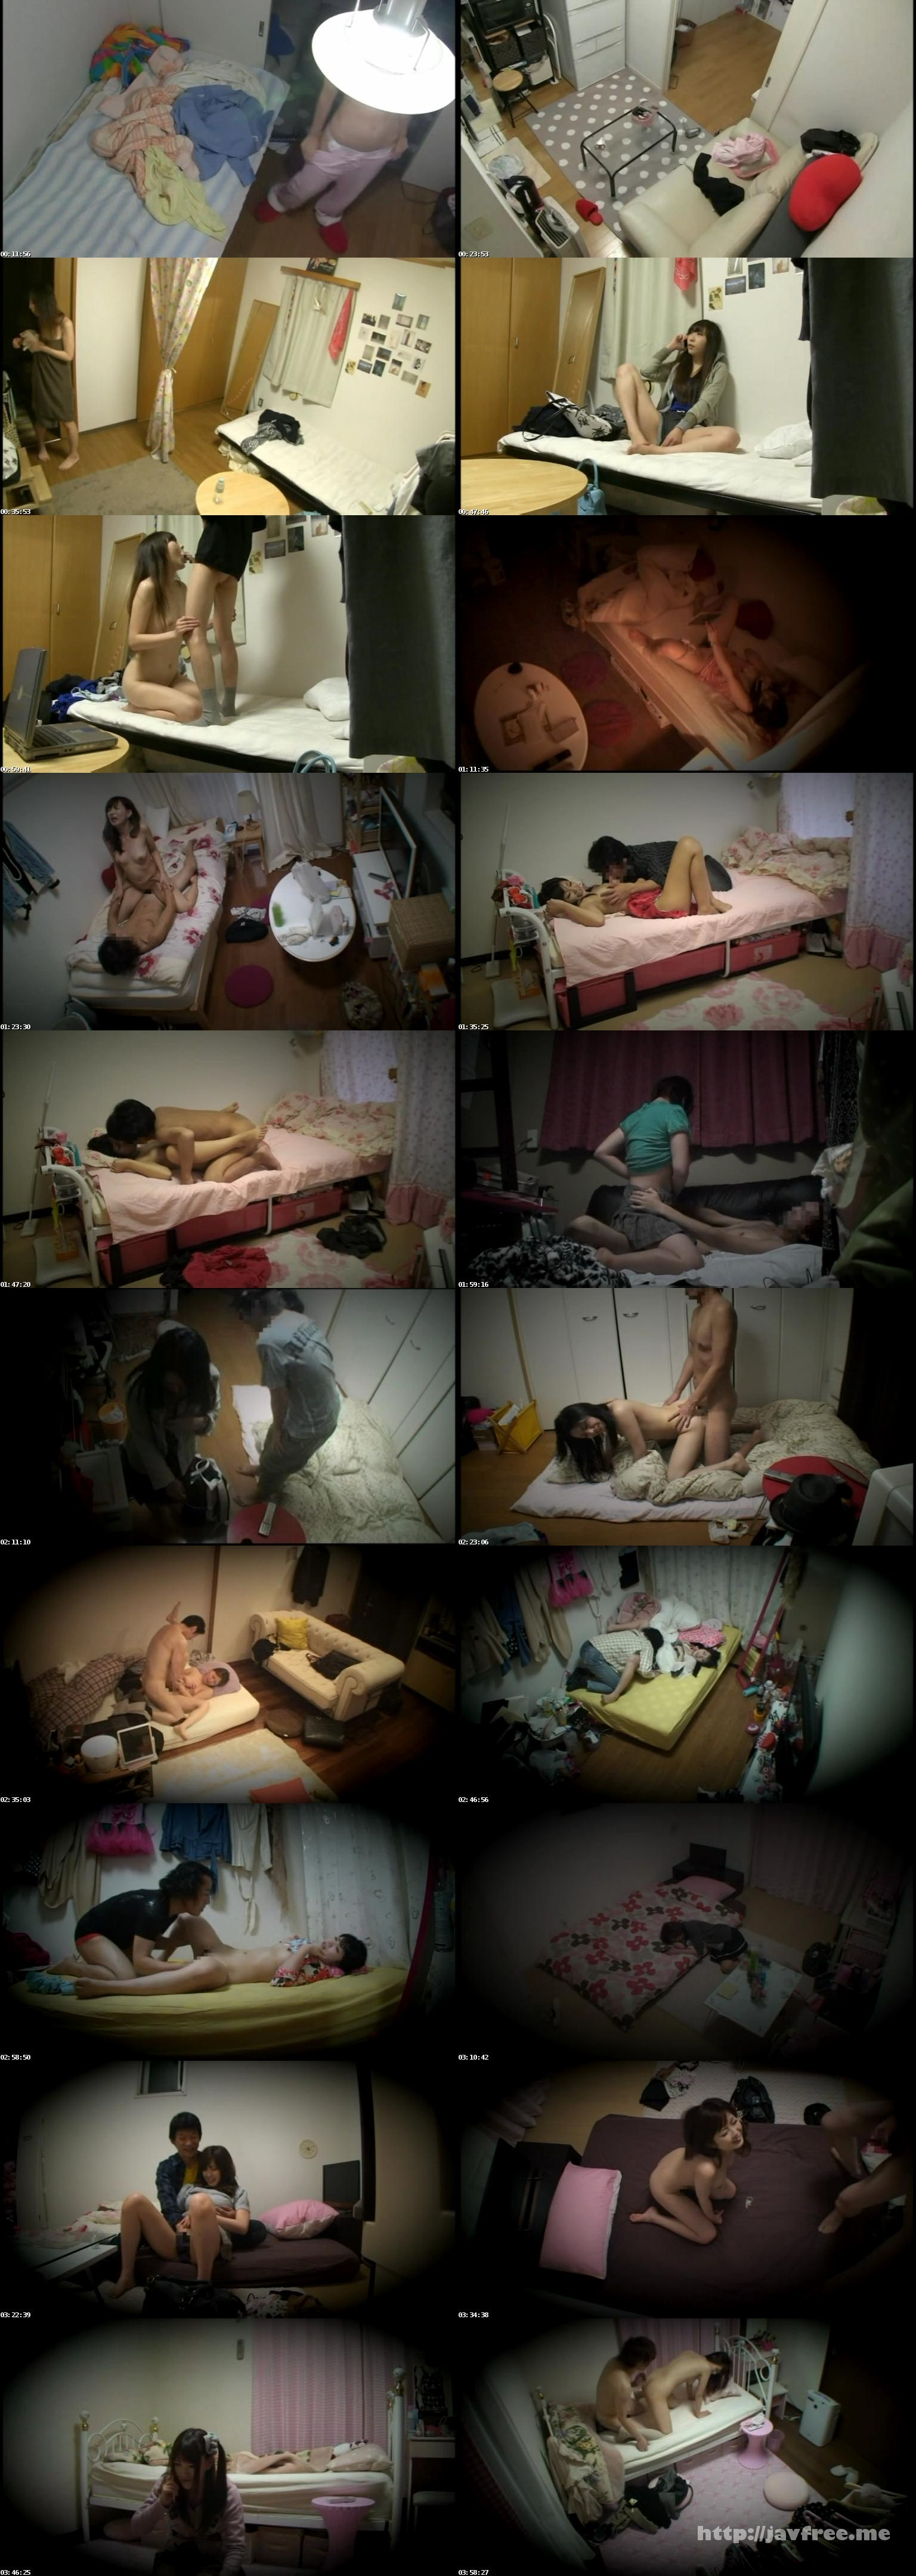 [EQ 202] 覗き見されたシロウトのカラダ 女性宅に仕込まれていた盗撮カメラ回収販売 2 EQ